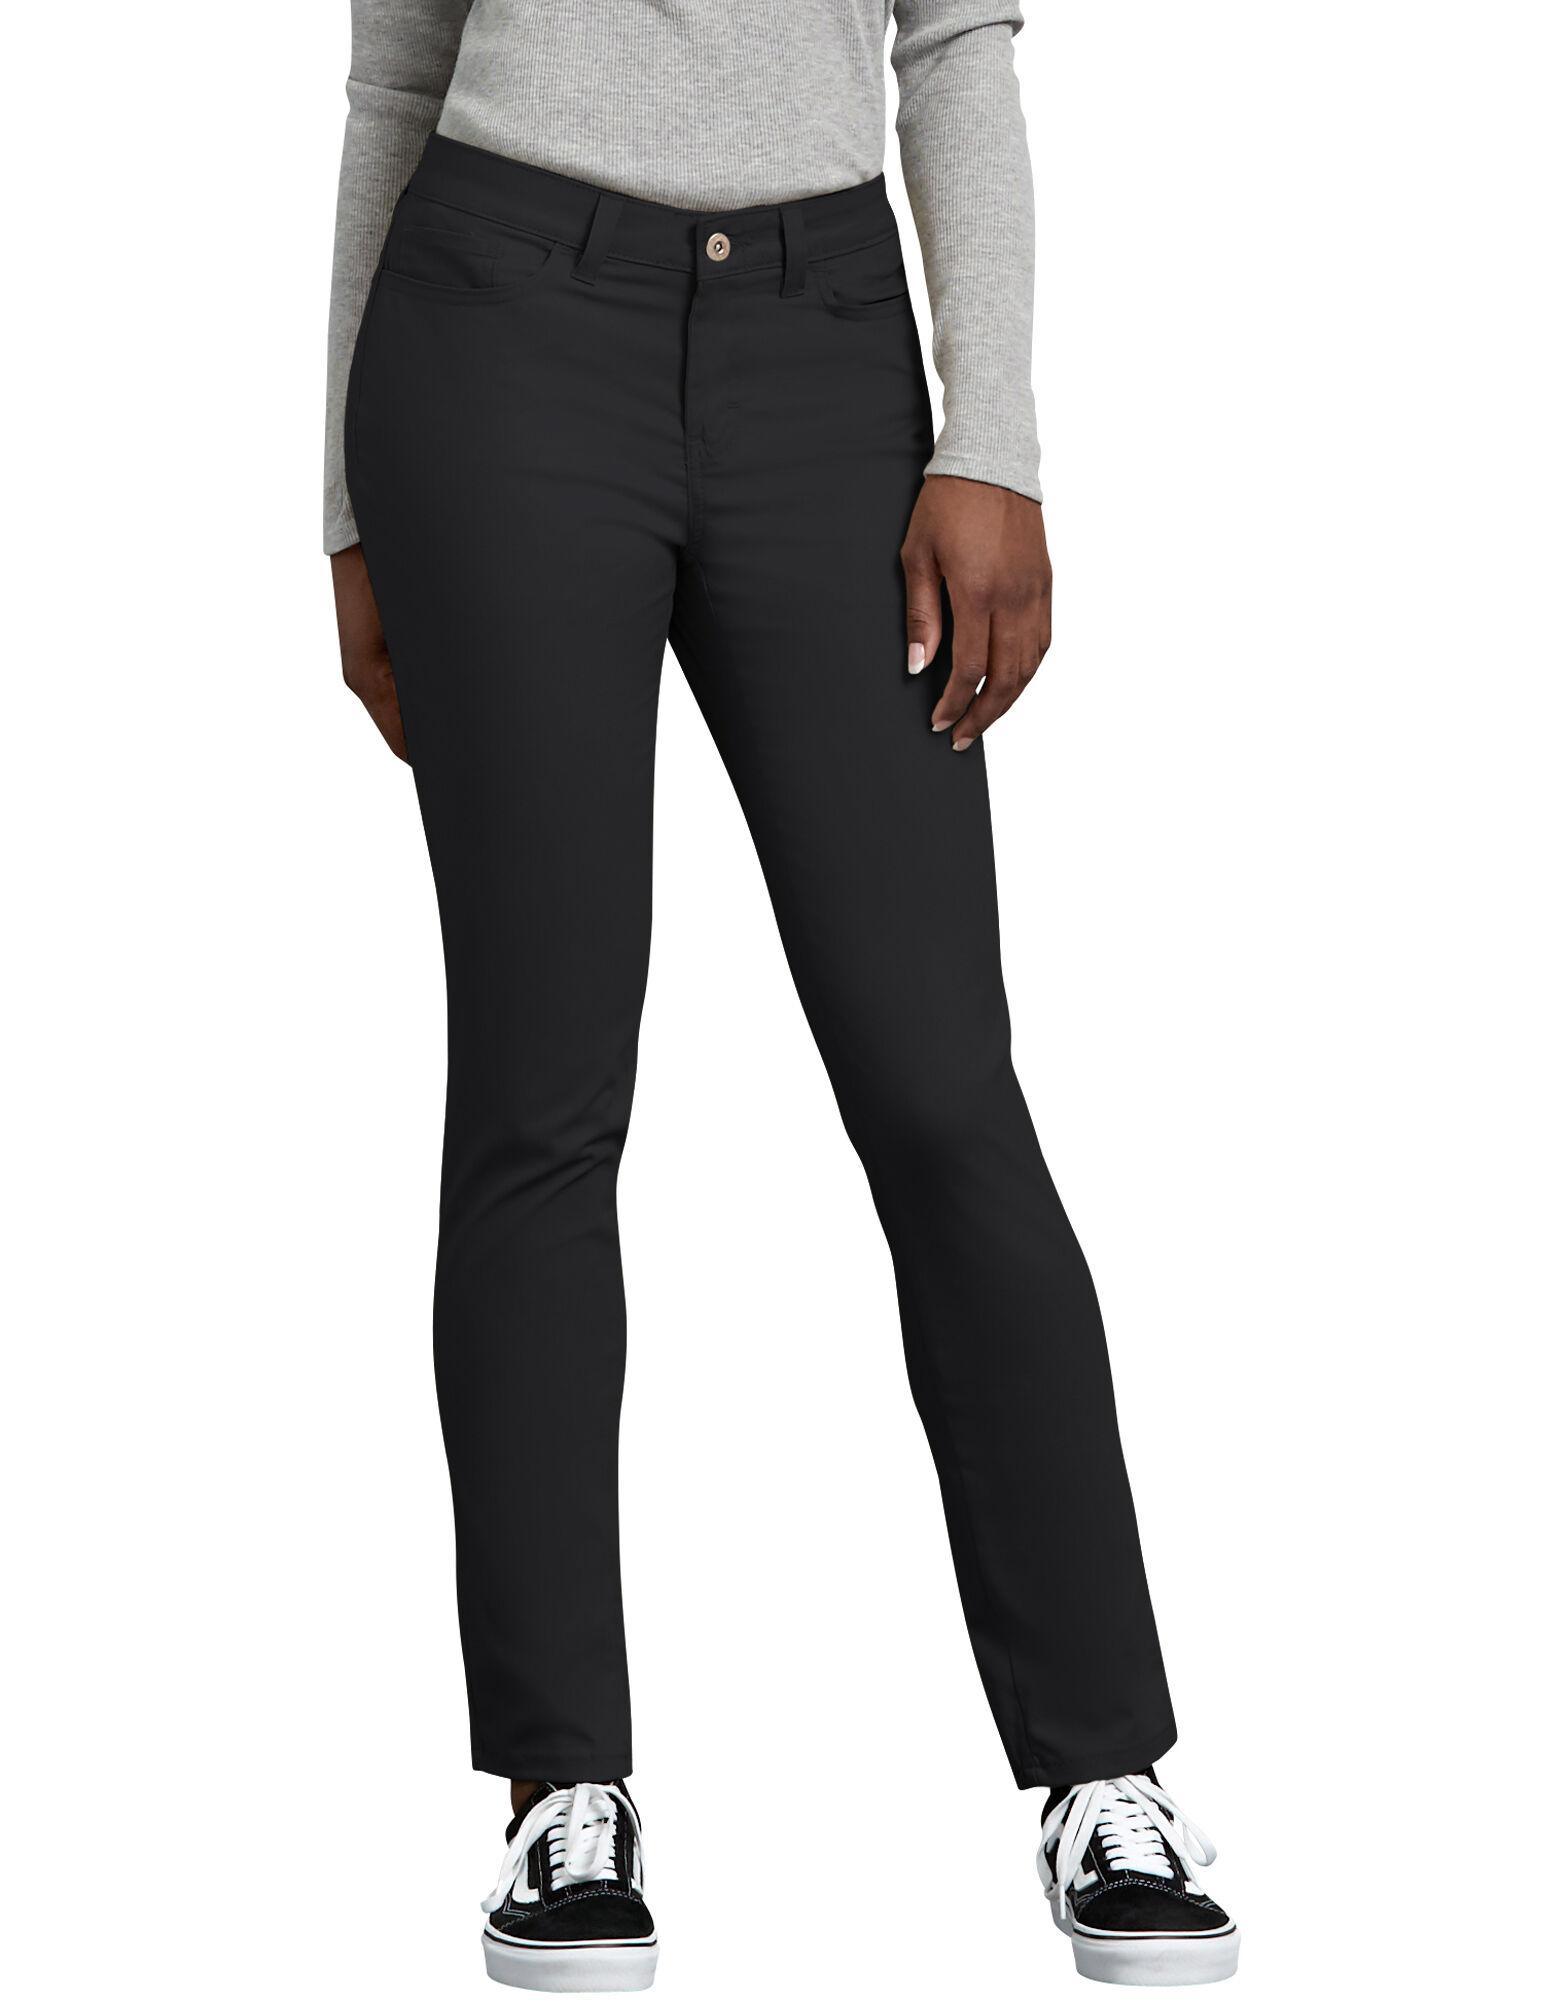 Women's Slim Fit Skinny Leg 5-Pocket Stretch Twill Pant ...